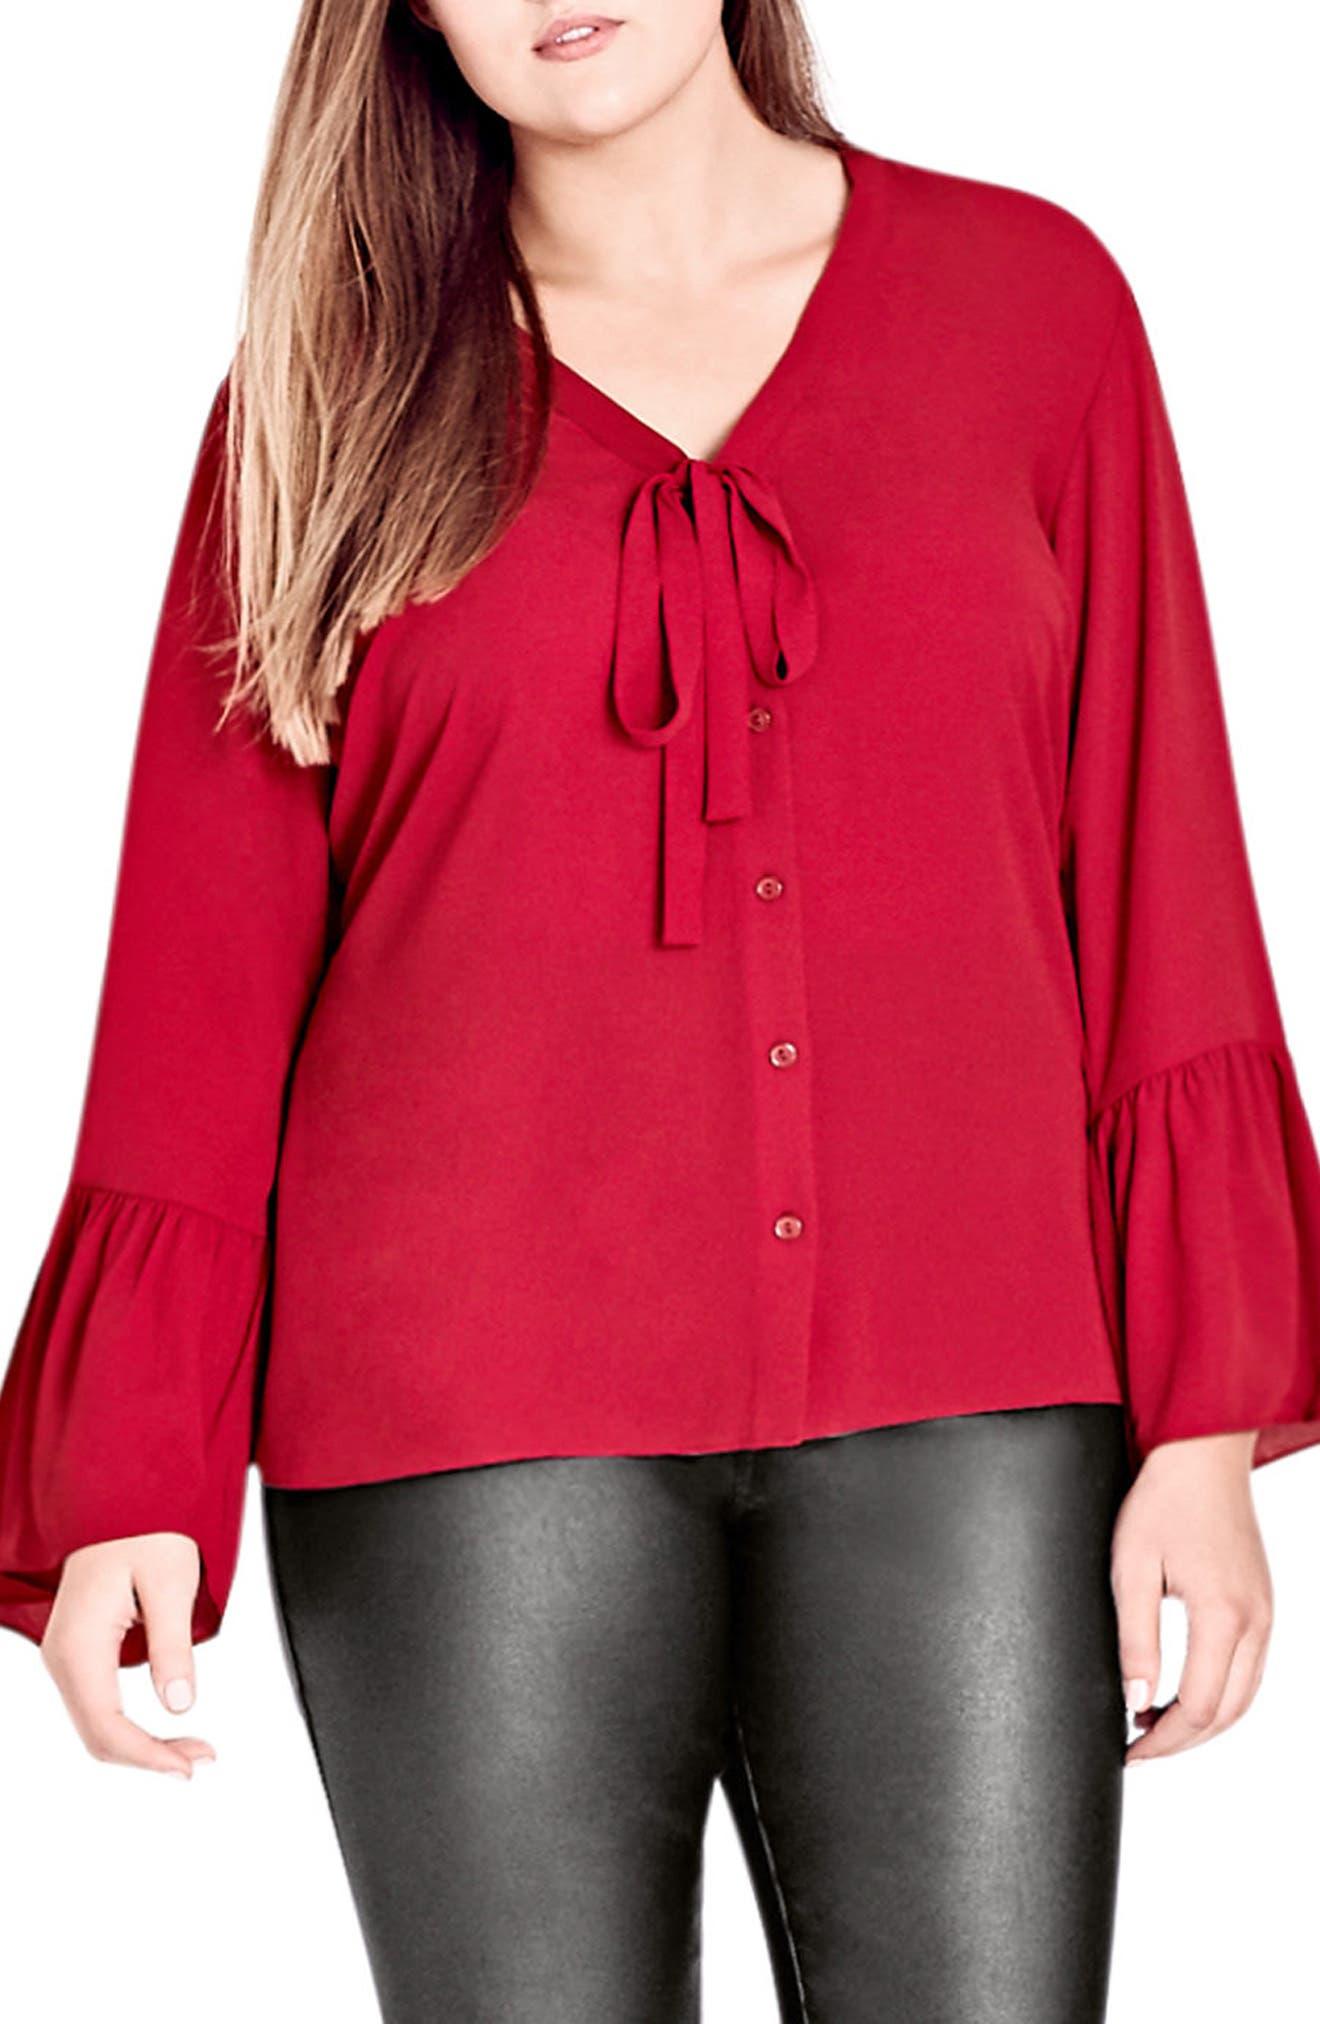 Office Fling Shirt,                             Main thumbnail 1, color,                             RED ROSE